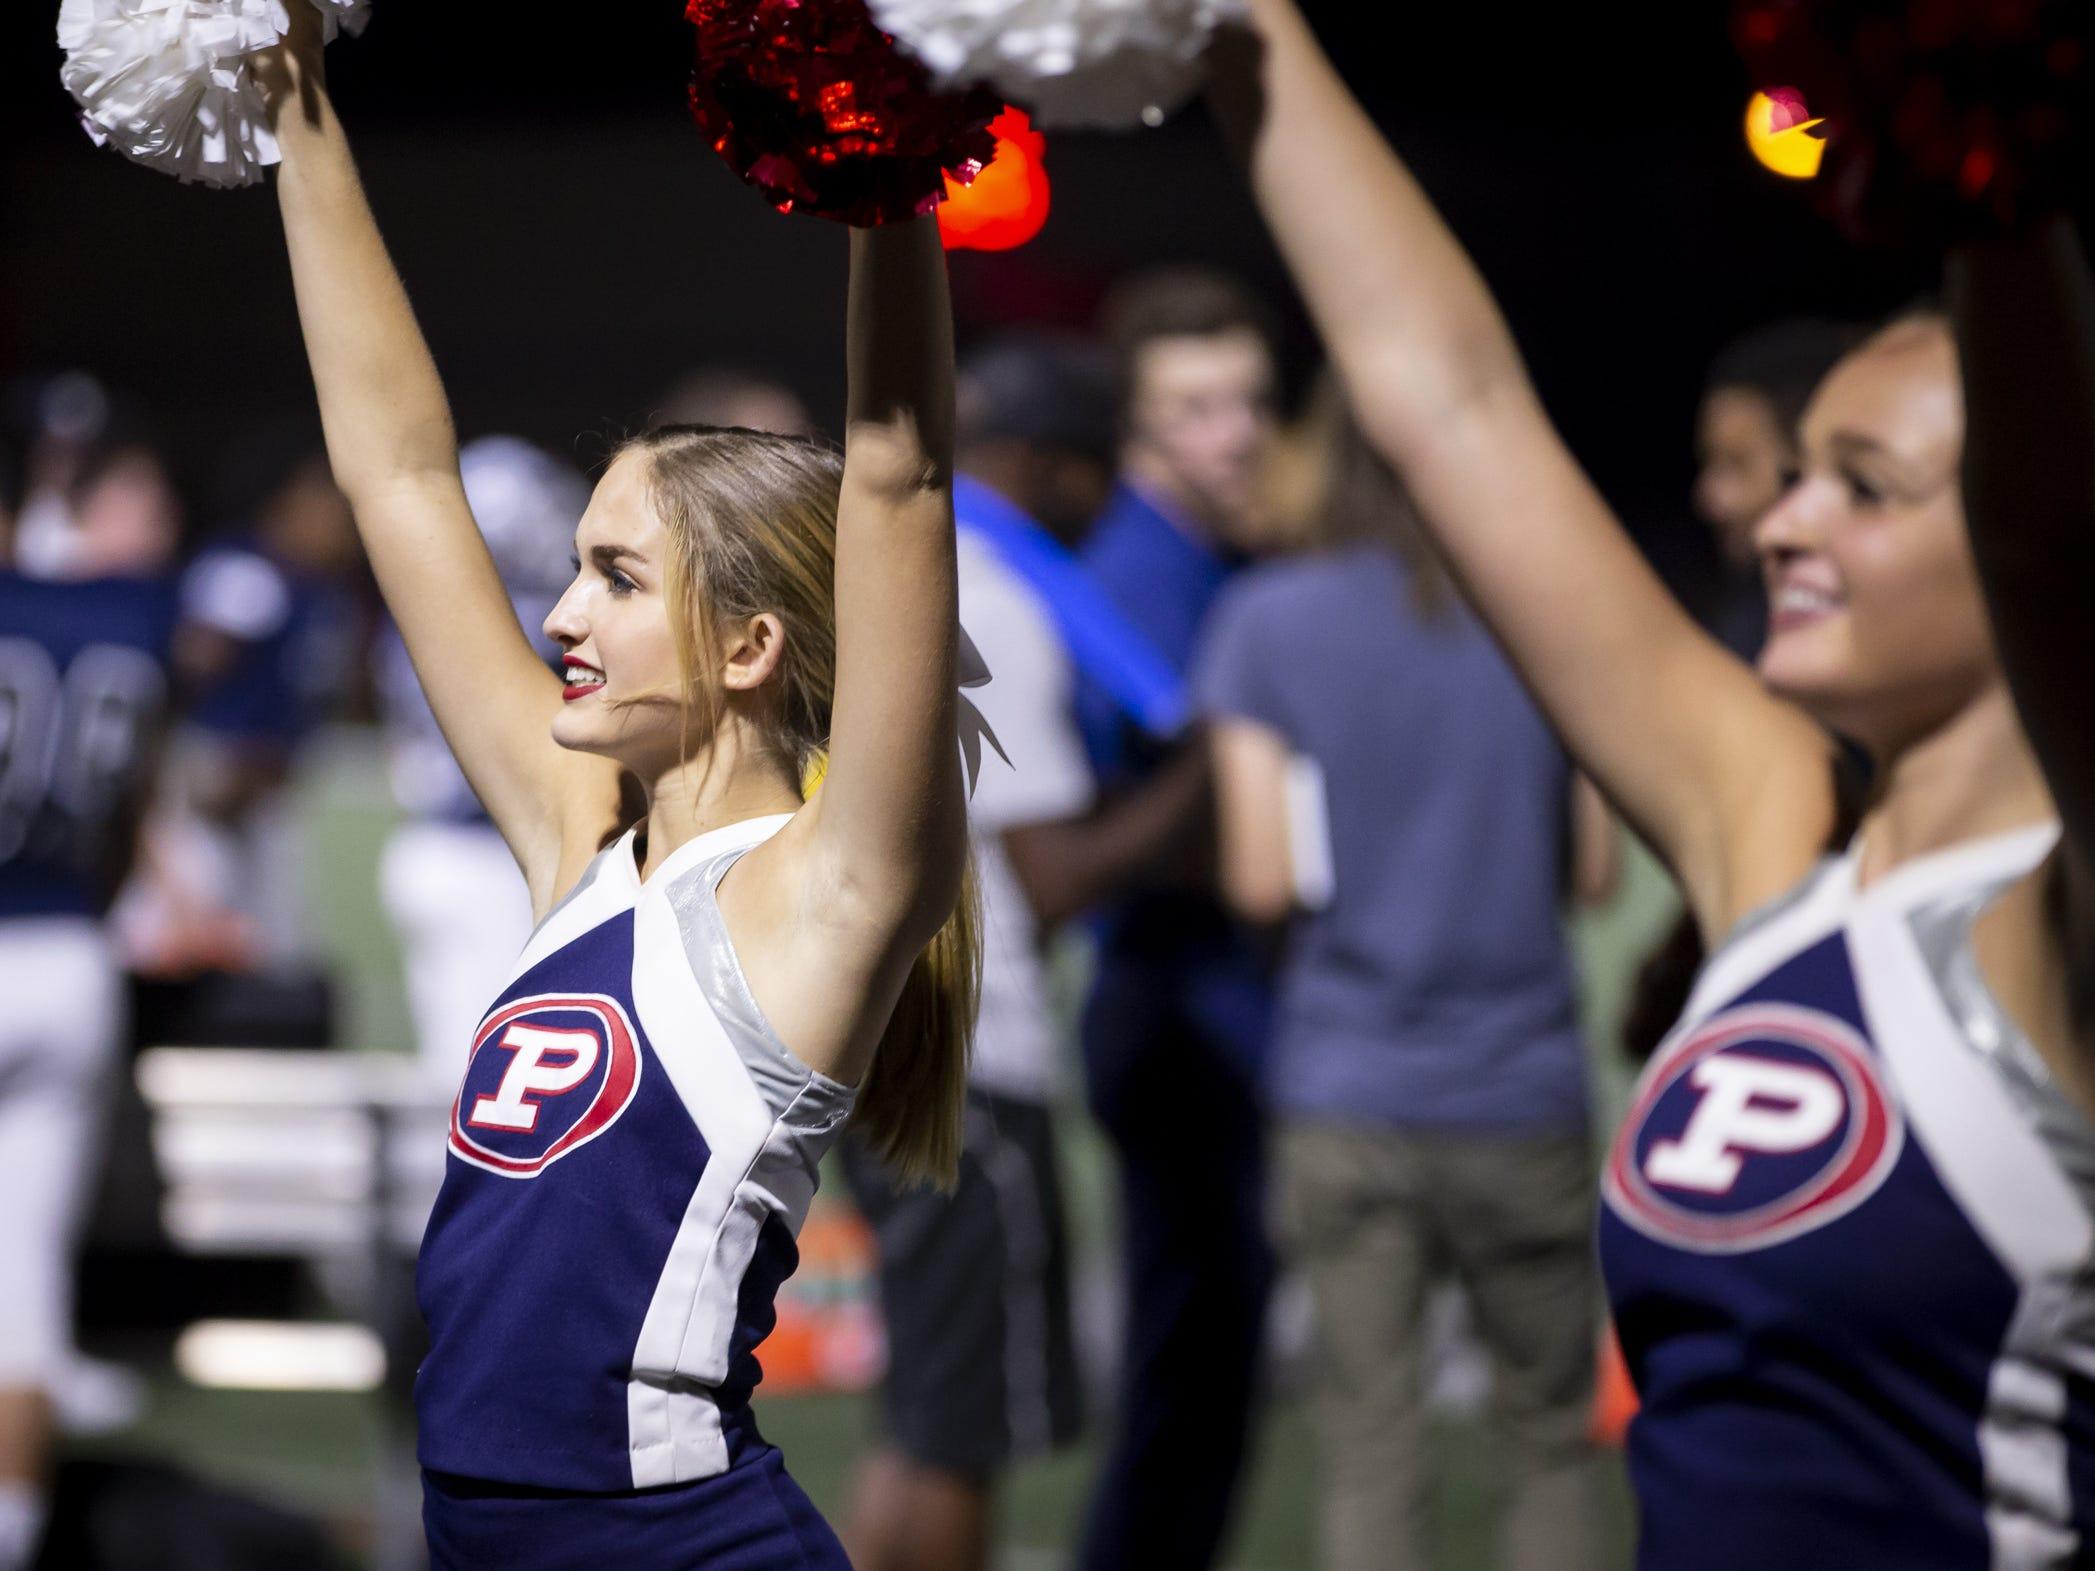 Pinnacle cheerleader Shaye Bergstrom cheers during the game against the Perry Pumas at Pinnacle High School on Friday, August 17, 2018 in Phoenix, Arizona.